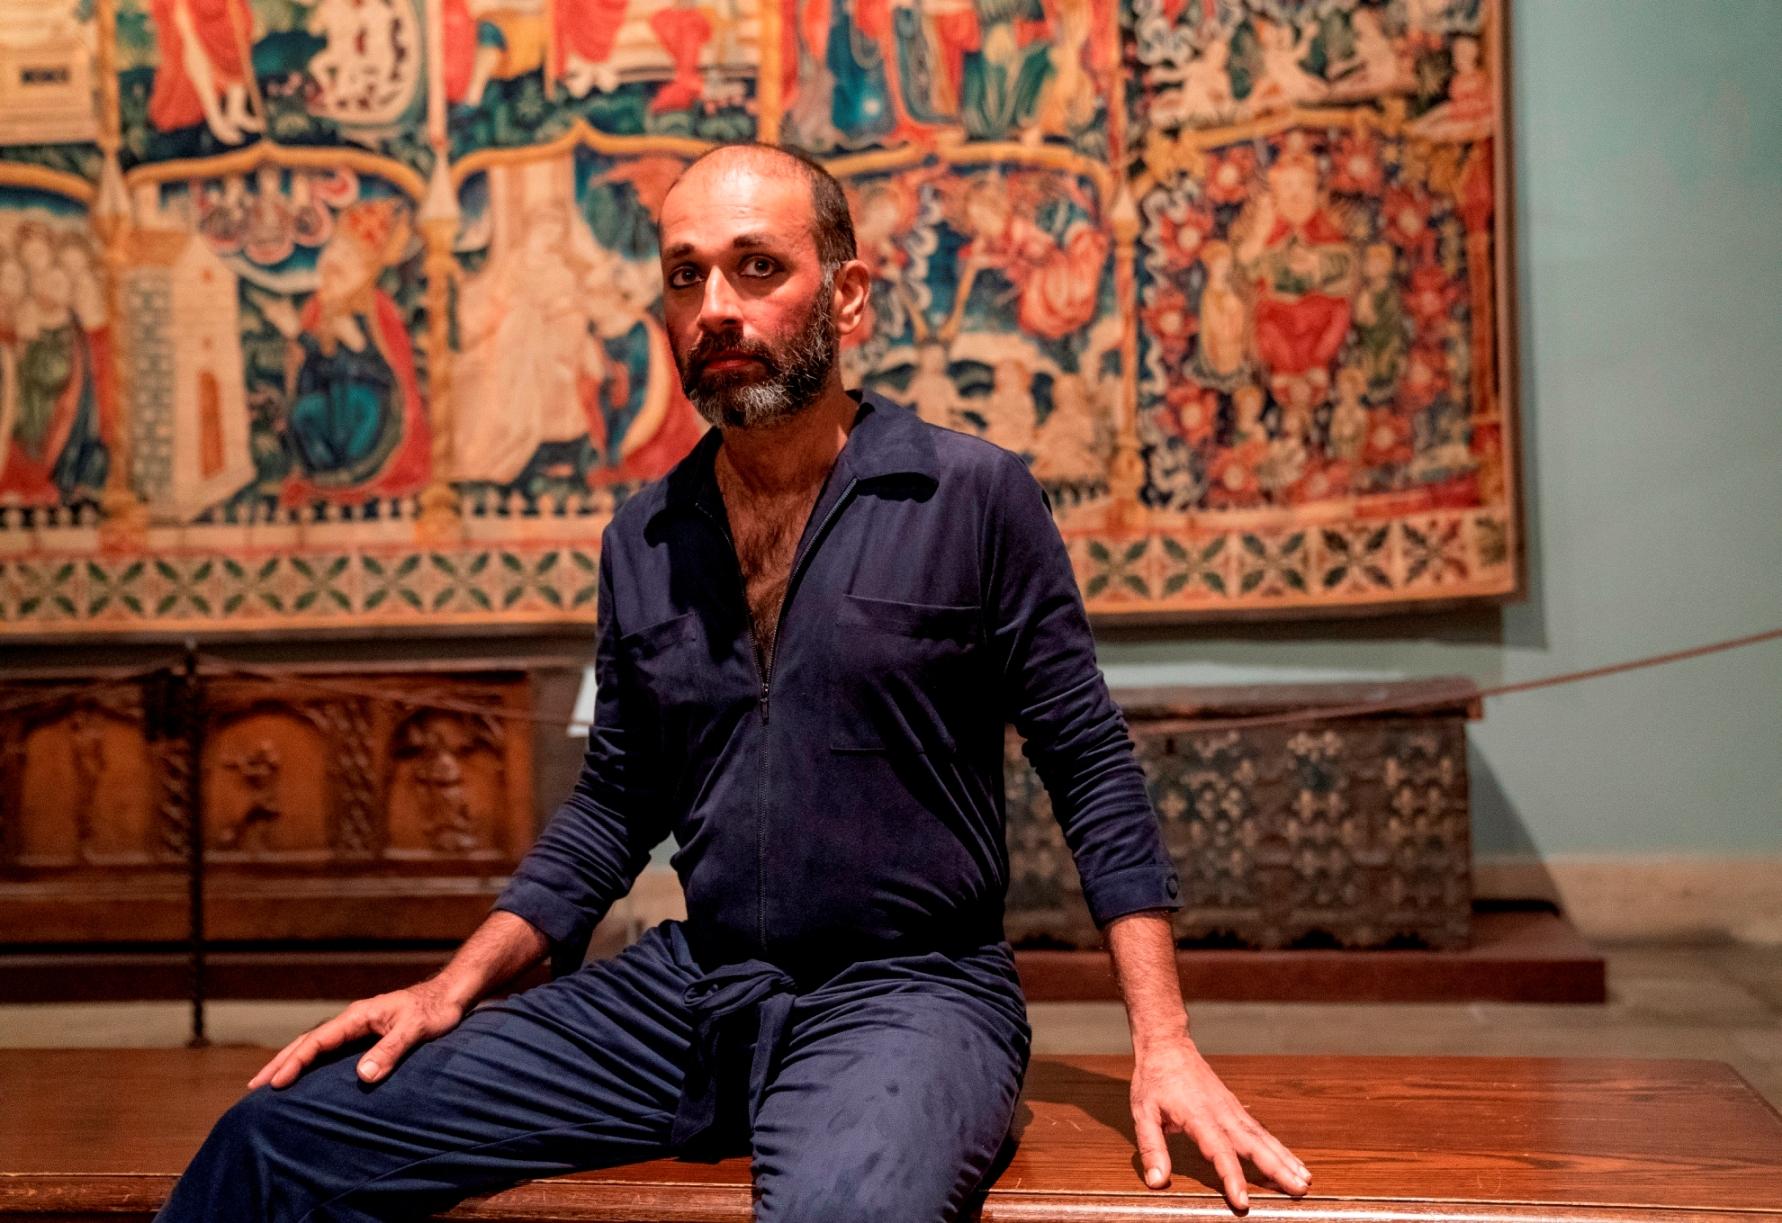 Nikhil Chopra. Image courtesy: Stephanie Berger